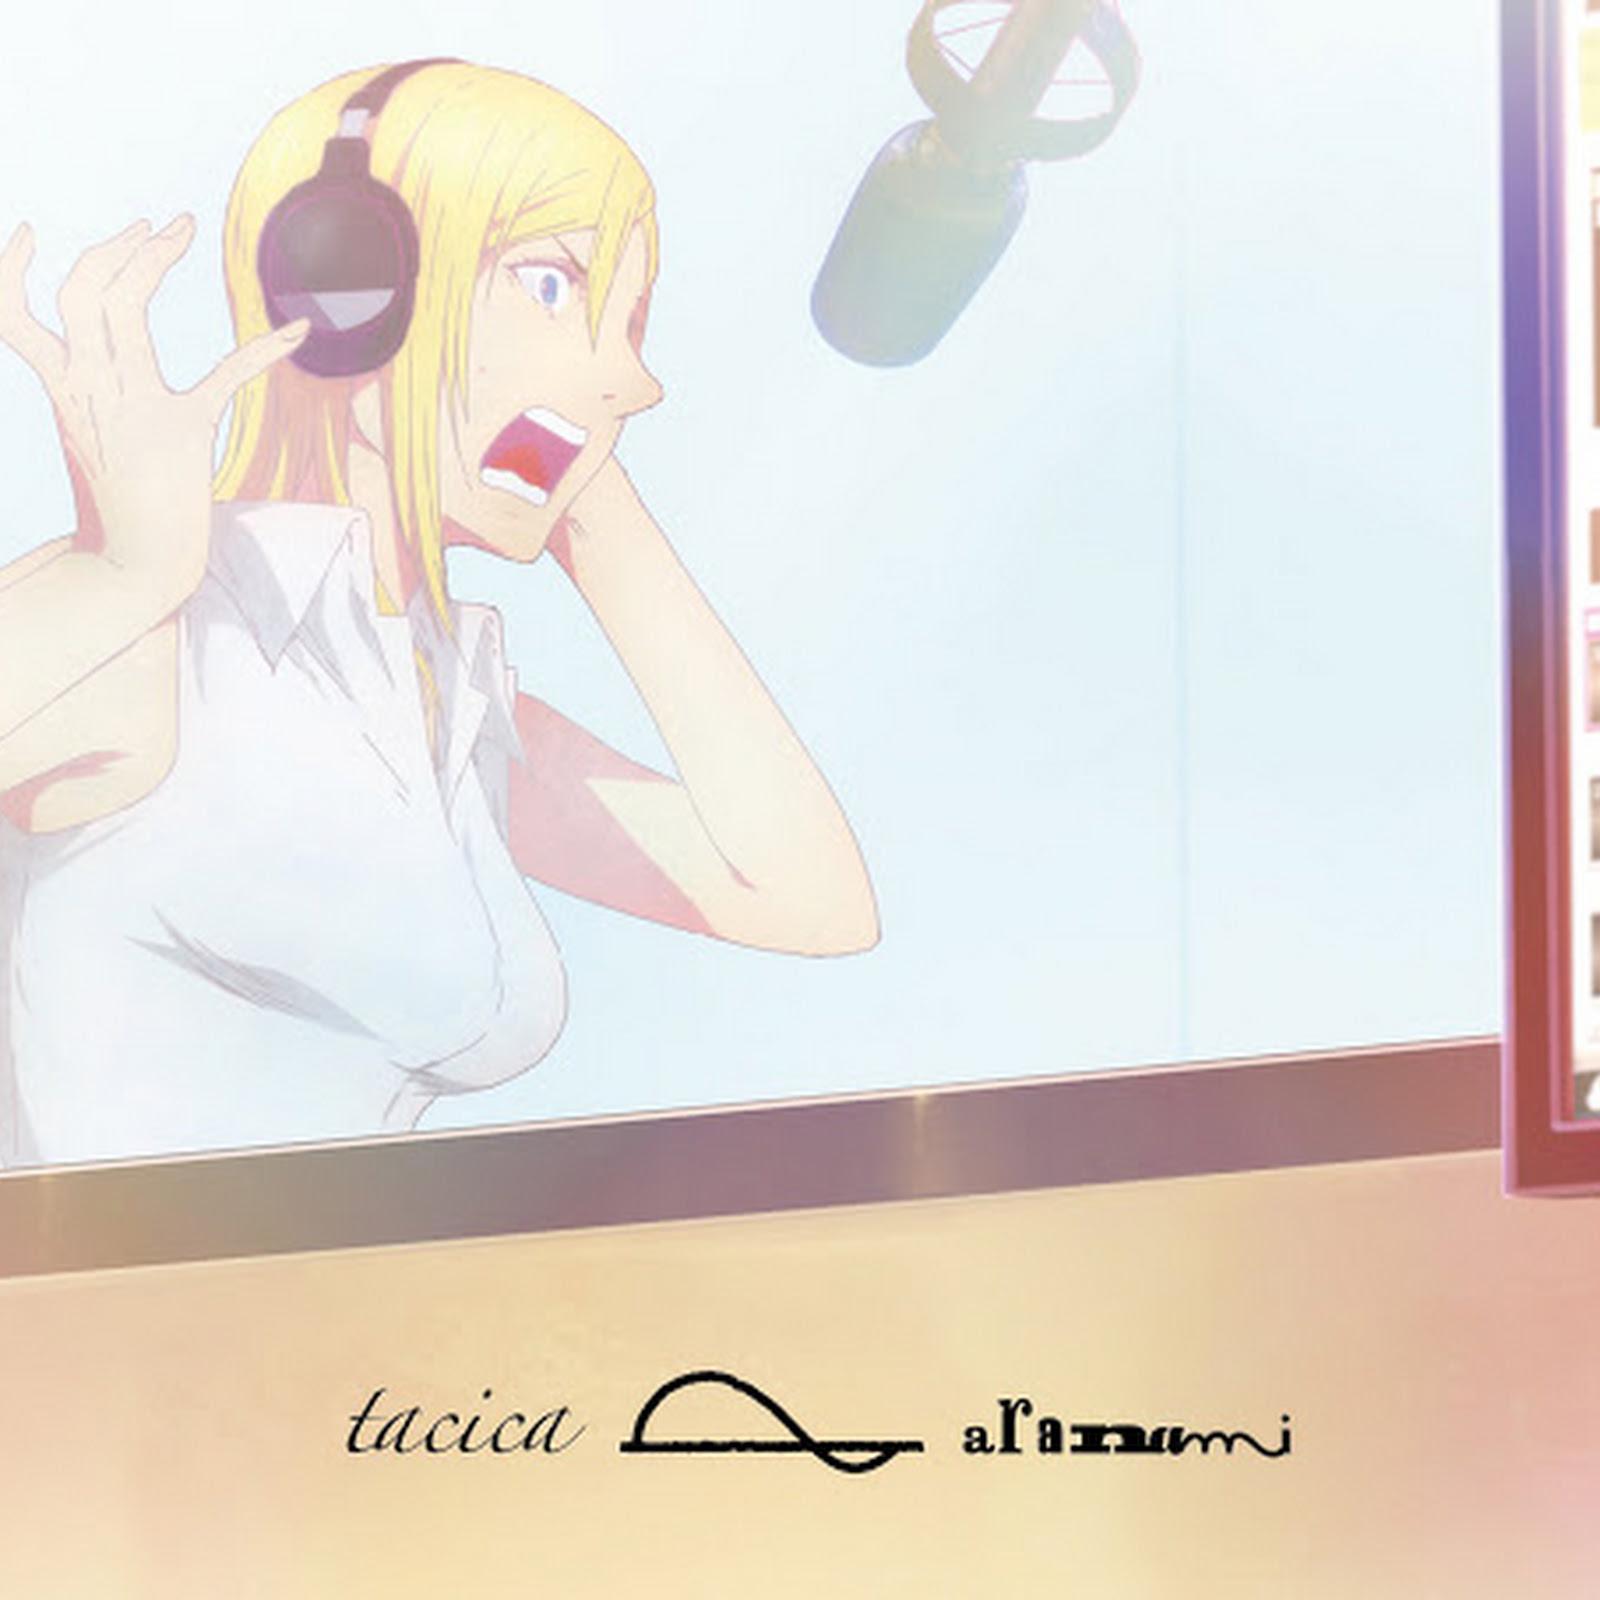 ▷ Descargar Nami yo Kiitekure OST - OP [Extendido] [MP3-320Kbps]